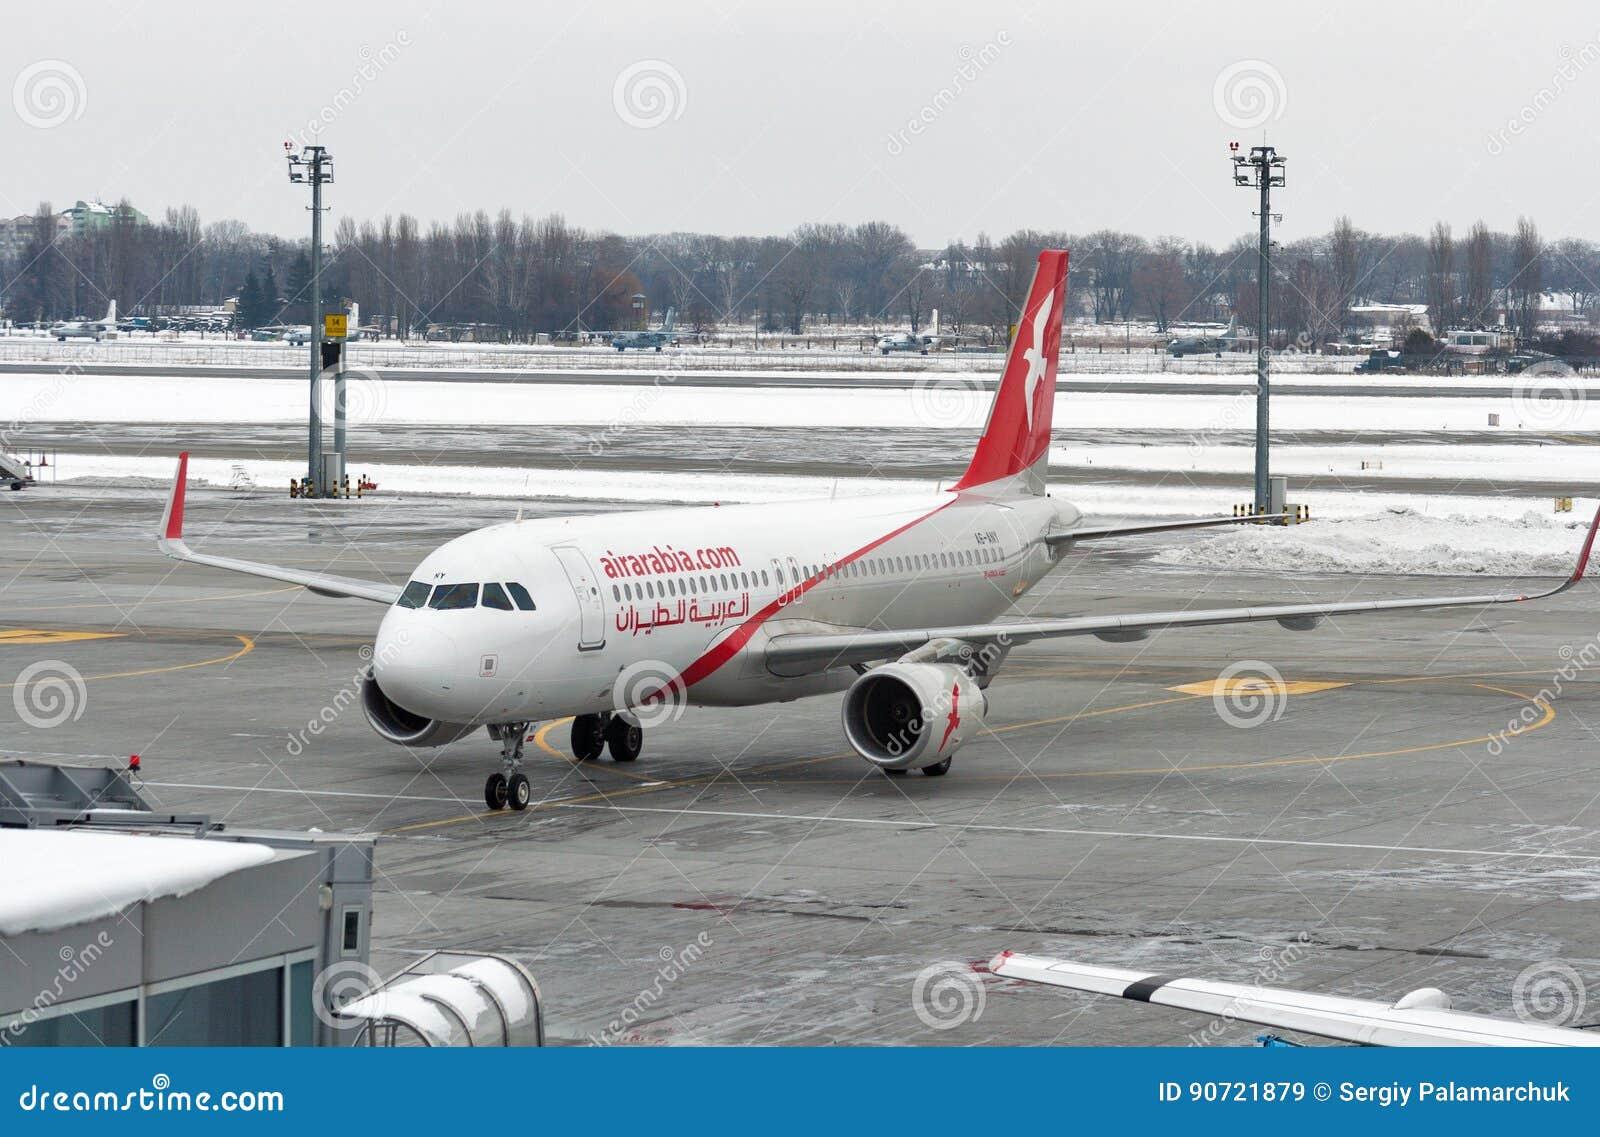 Aeroporto Kiev : Aeroplano di air arabia nell aeroporto di boryspil kiev ucraina